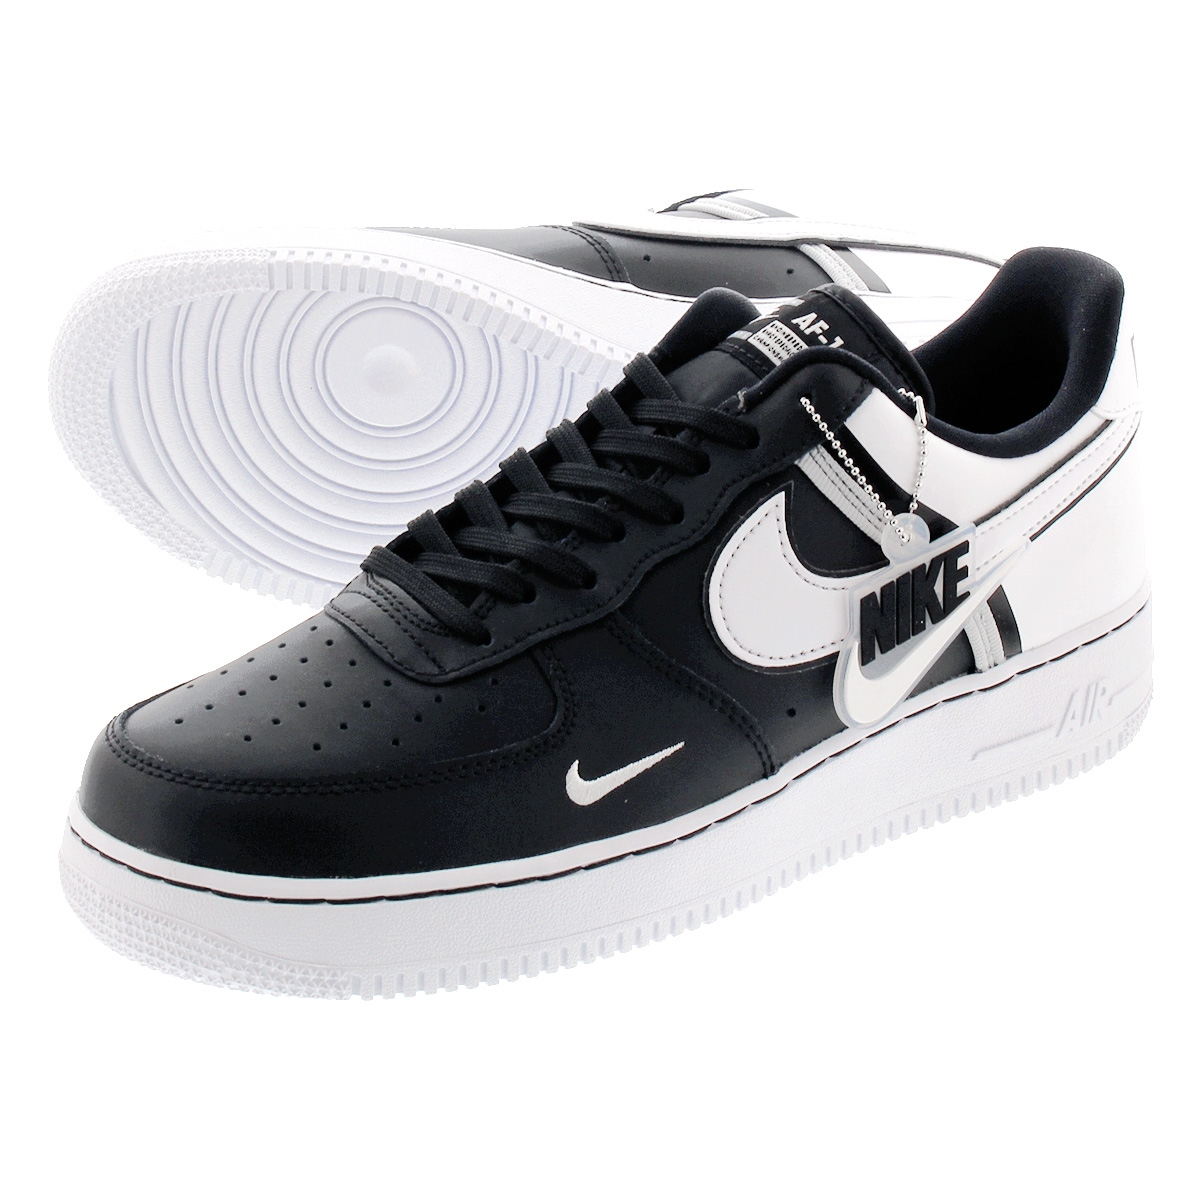 NIKE AIR FORCE 1 '07 LV8 2 Nike air force 1 '07 LV8 2 BLACKWHITE ci0061 001